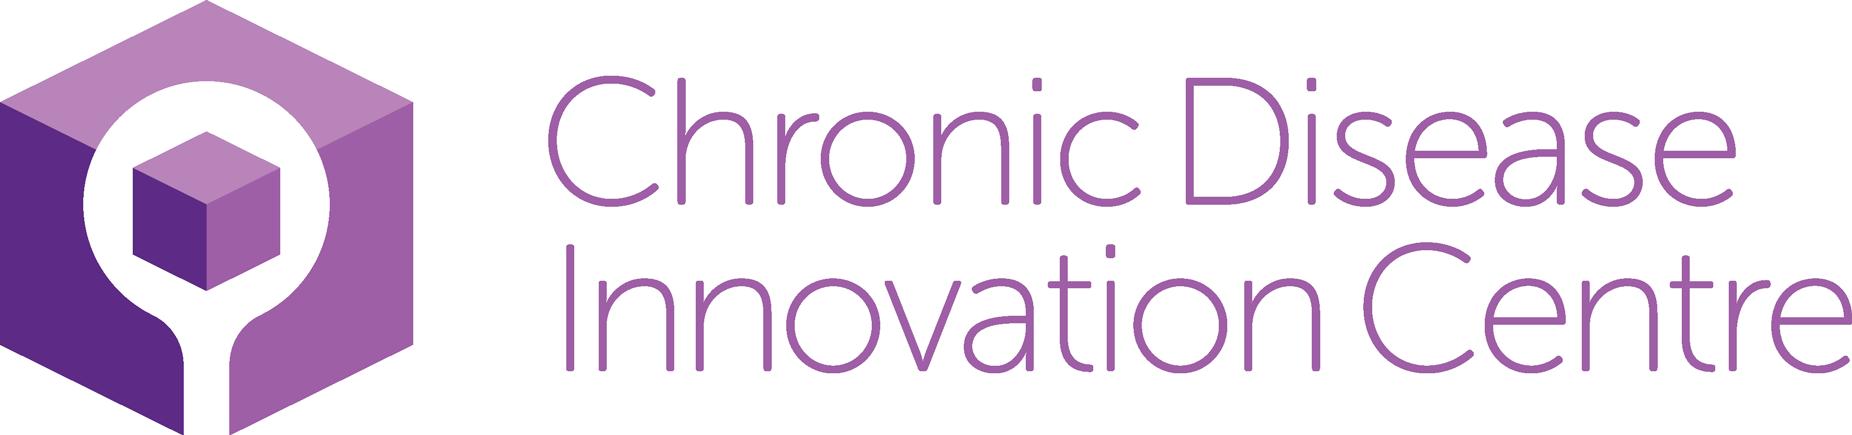 Chronic Disease Innovation Centre